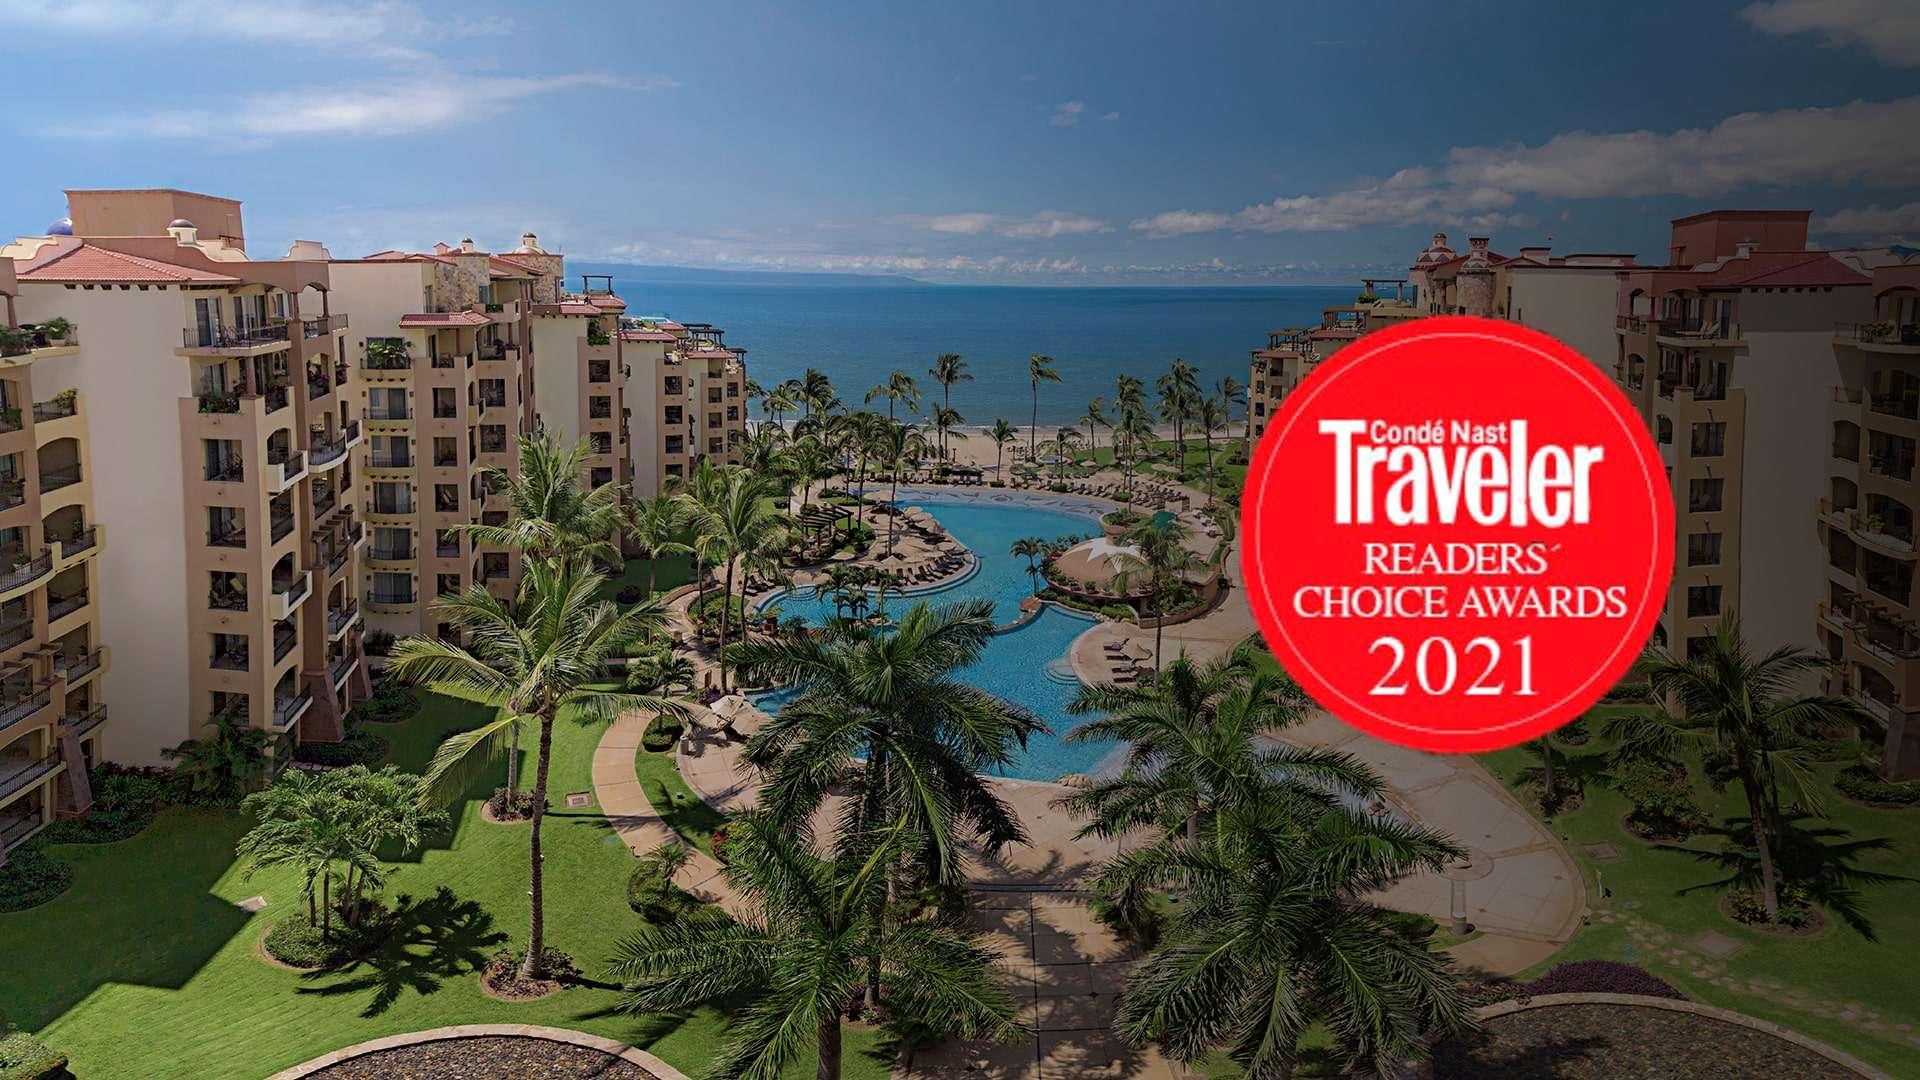 Villa La Estancia One Of The Best Resorts By Conde Nast Readers Choice Awards